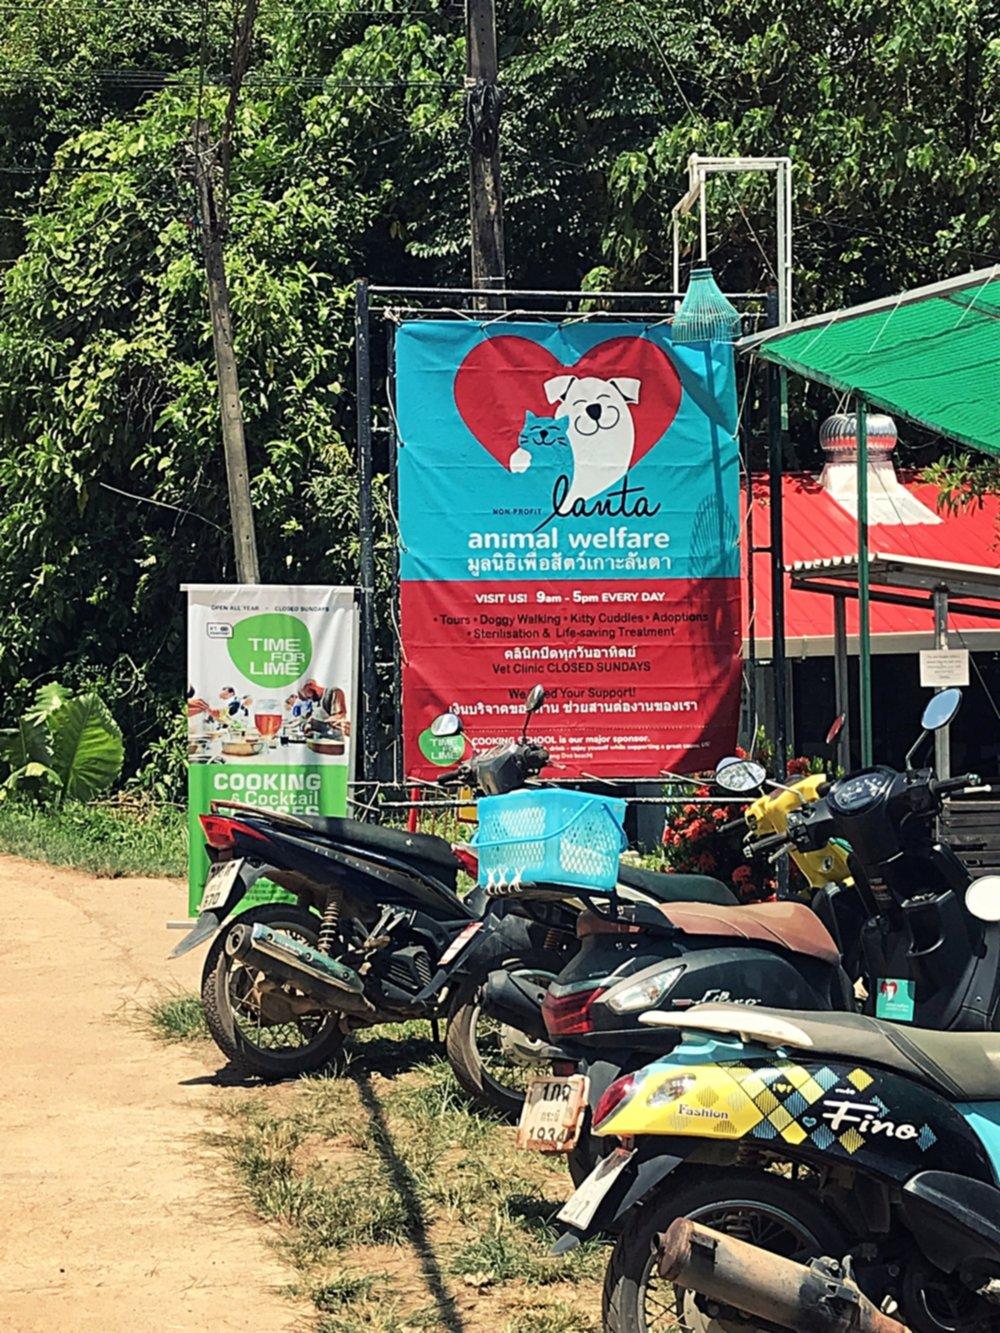 Lanta Animal Welfare, a nonprofit charity on Koh Lanta, Thailand